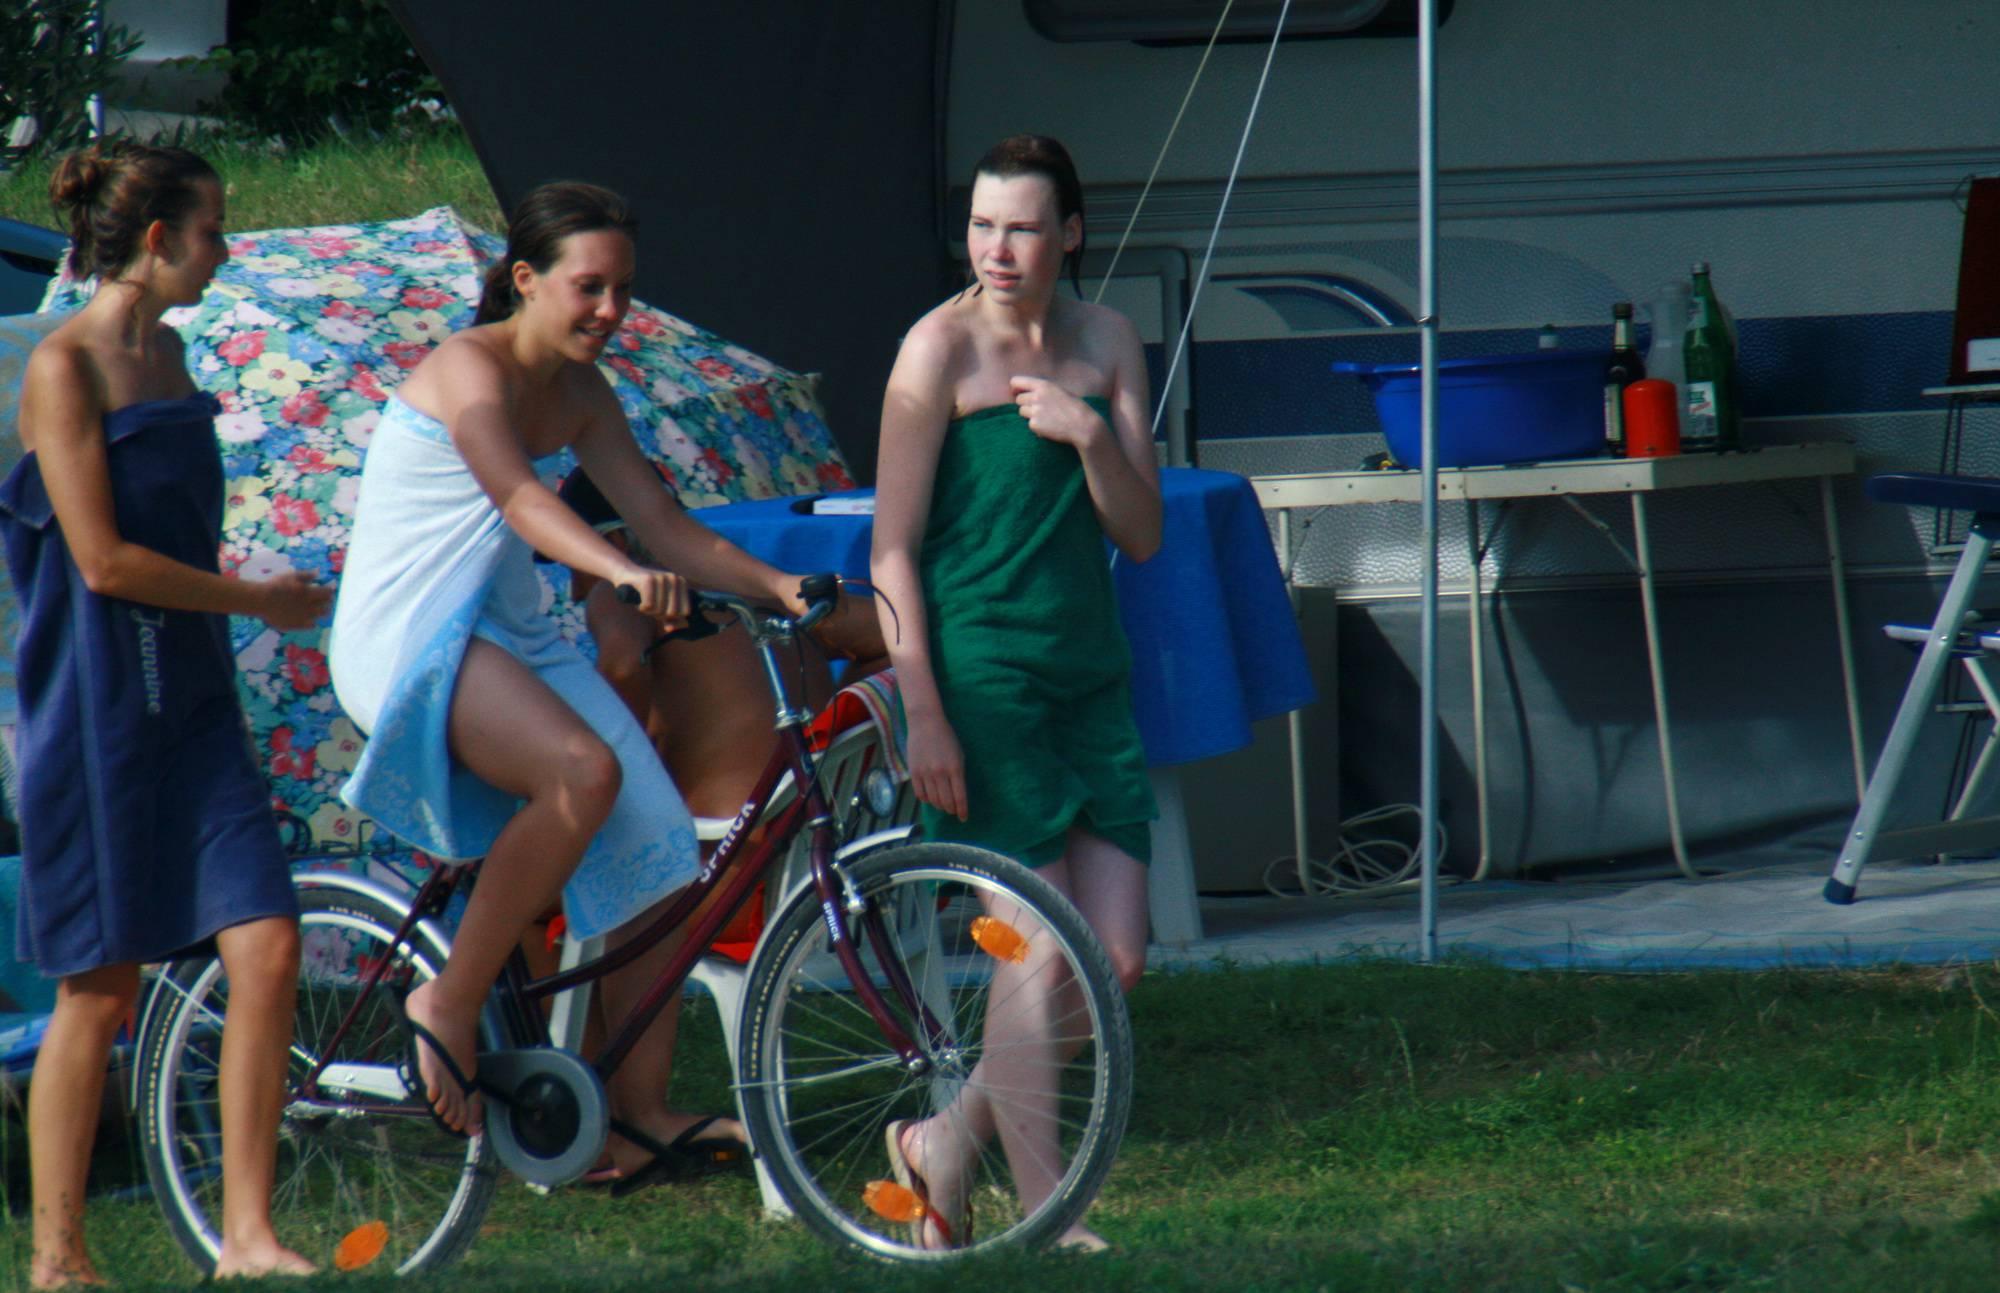 Nudist Pictures Nude Duet Walking and Bike - 1